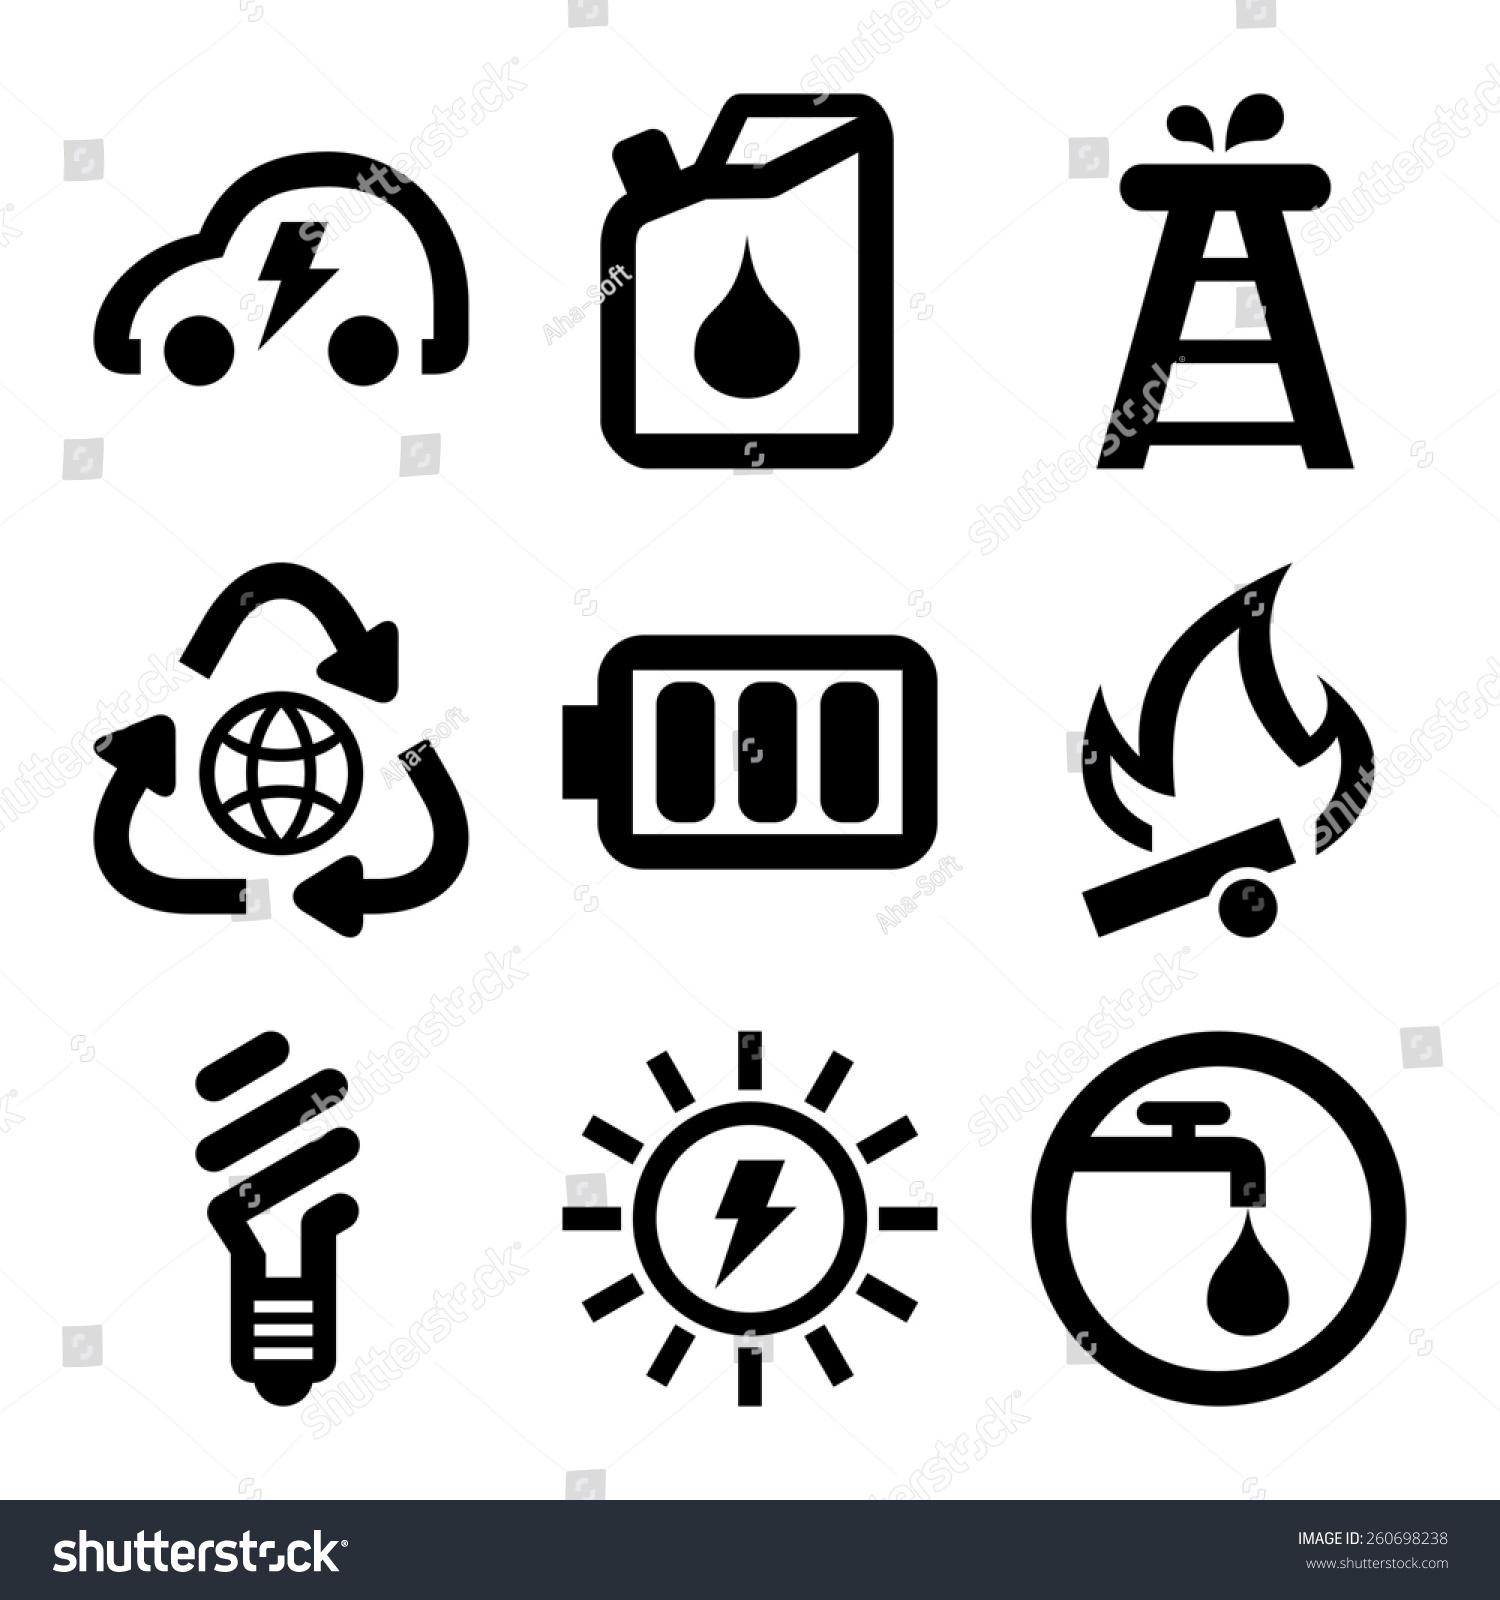 Lovely power pack symbol gallery electrical circuit diagram symbol of power supply dolgular buycottarizona